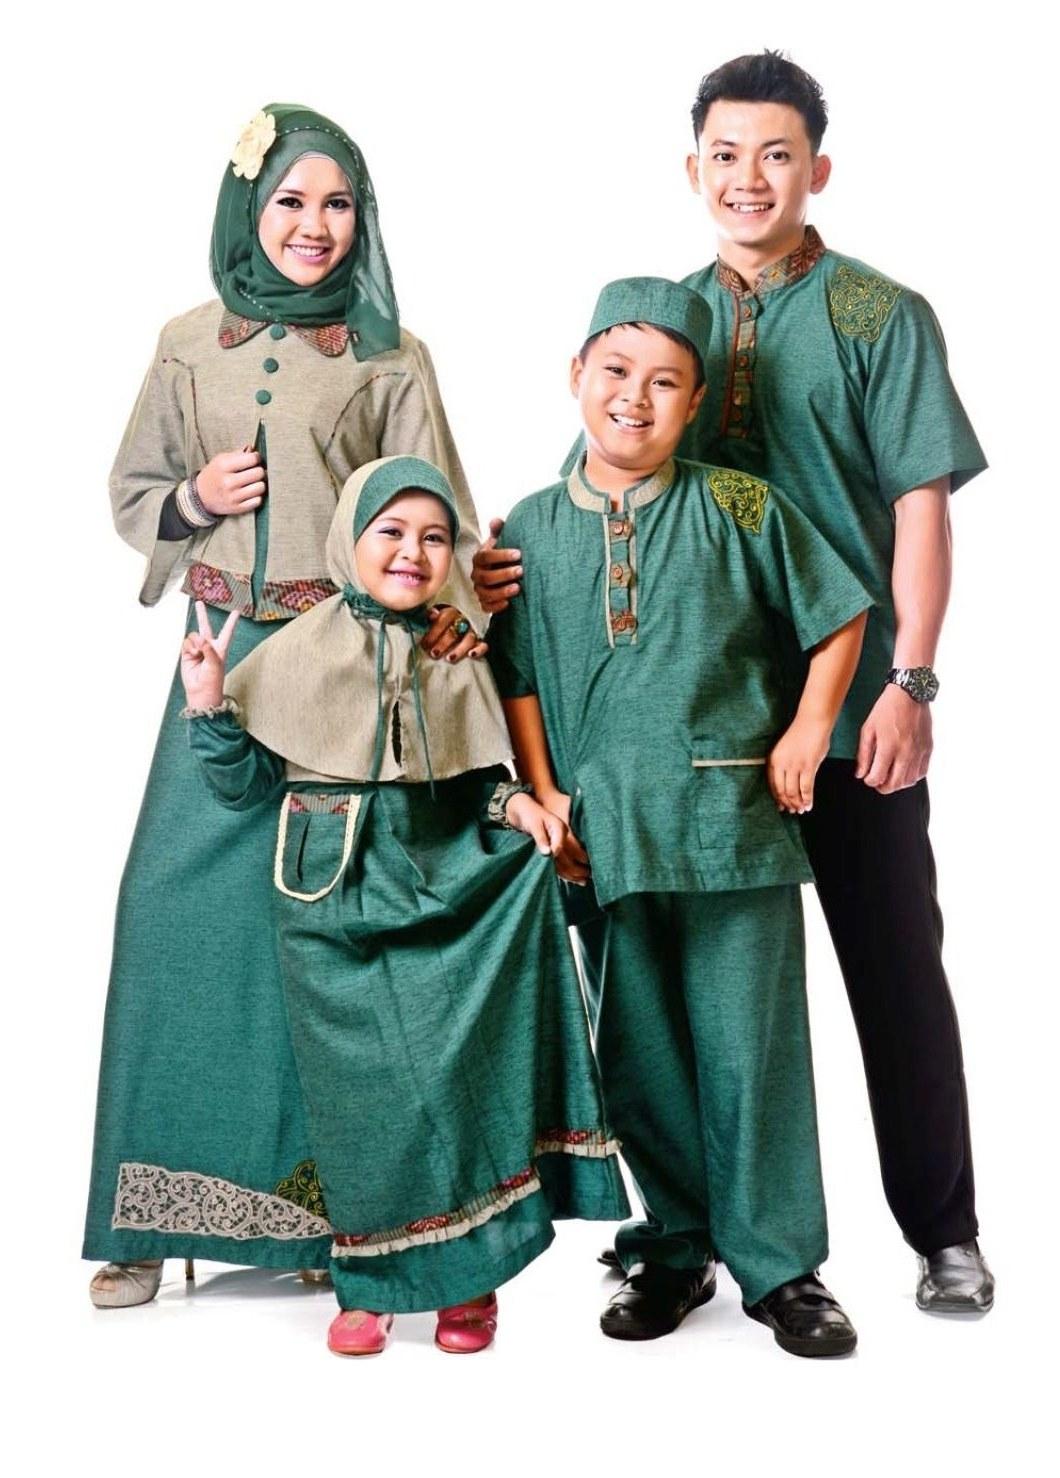 Inspirasi Desain Baju Lebaran Keluarga 2019 Bqdd 40 Baju Seragam Keluarga Lebaran 2020 Inspirasi Terbaru